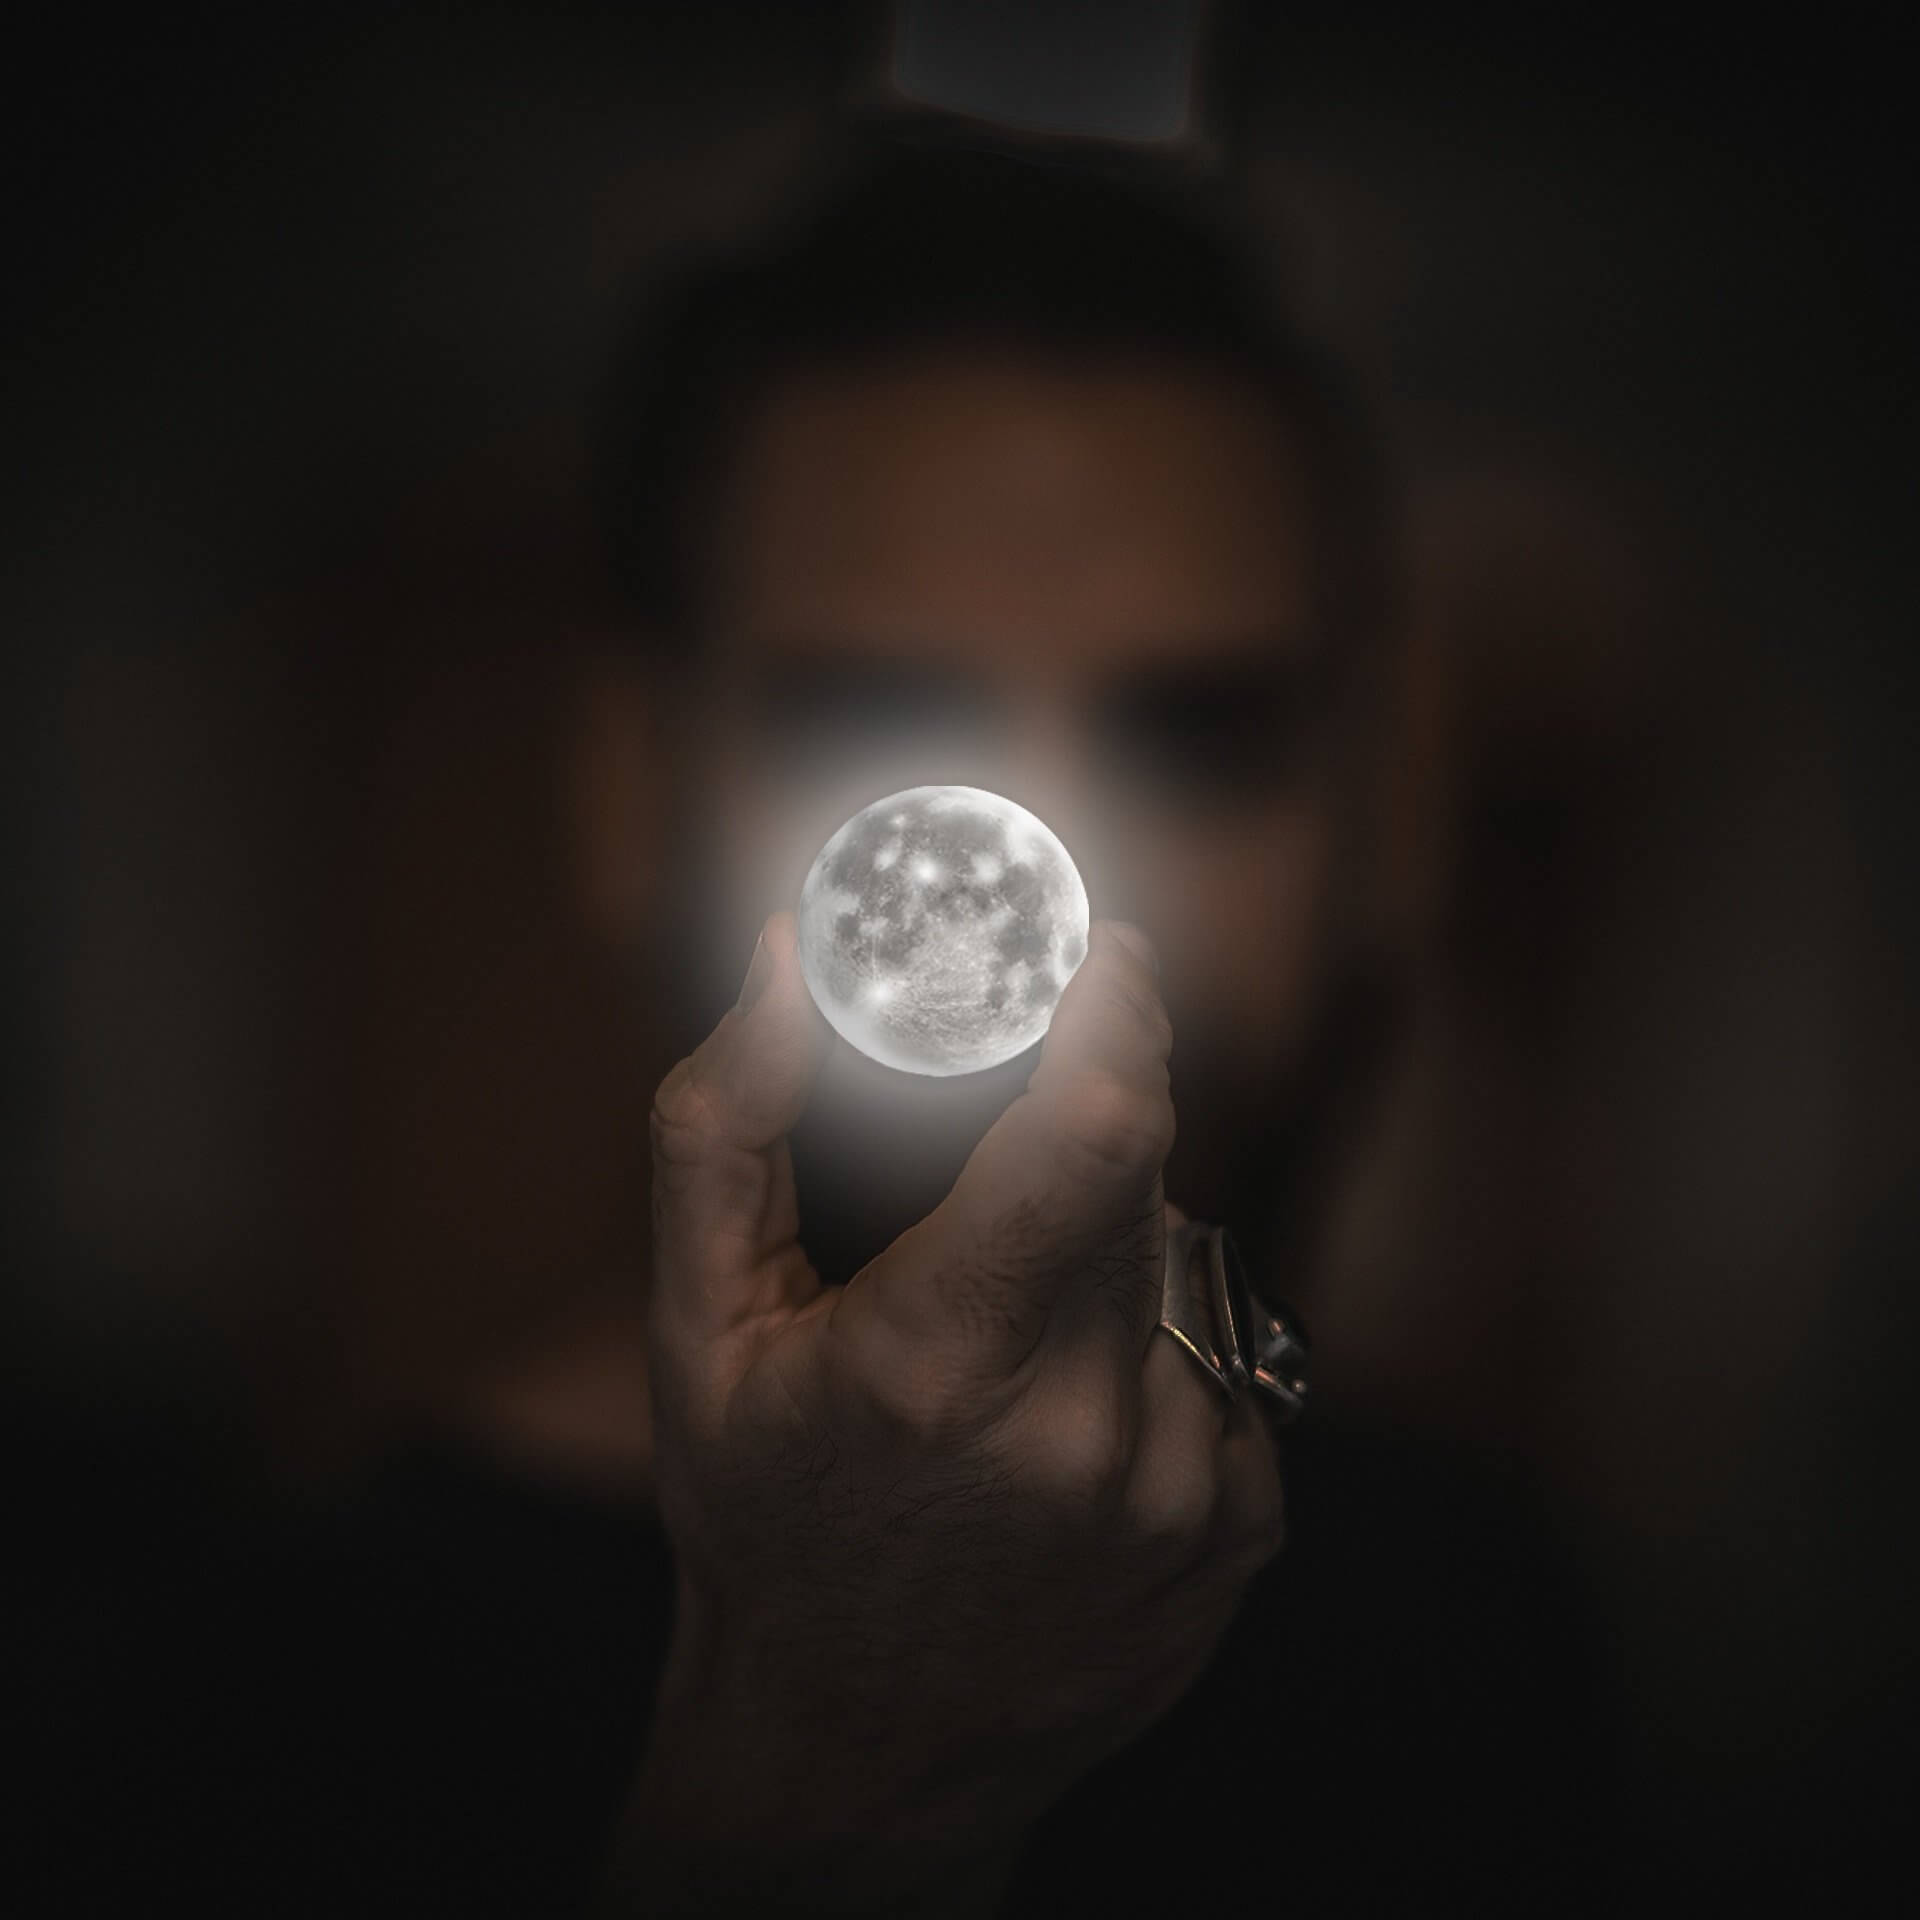 moon-fine-tuning